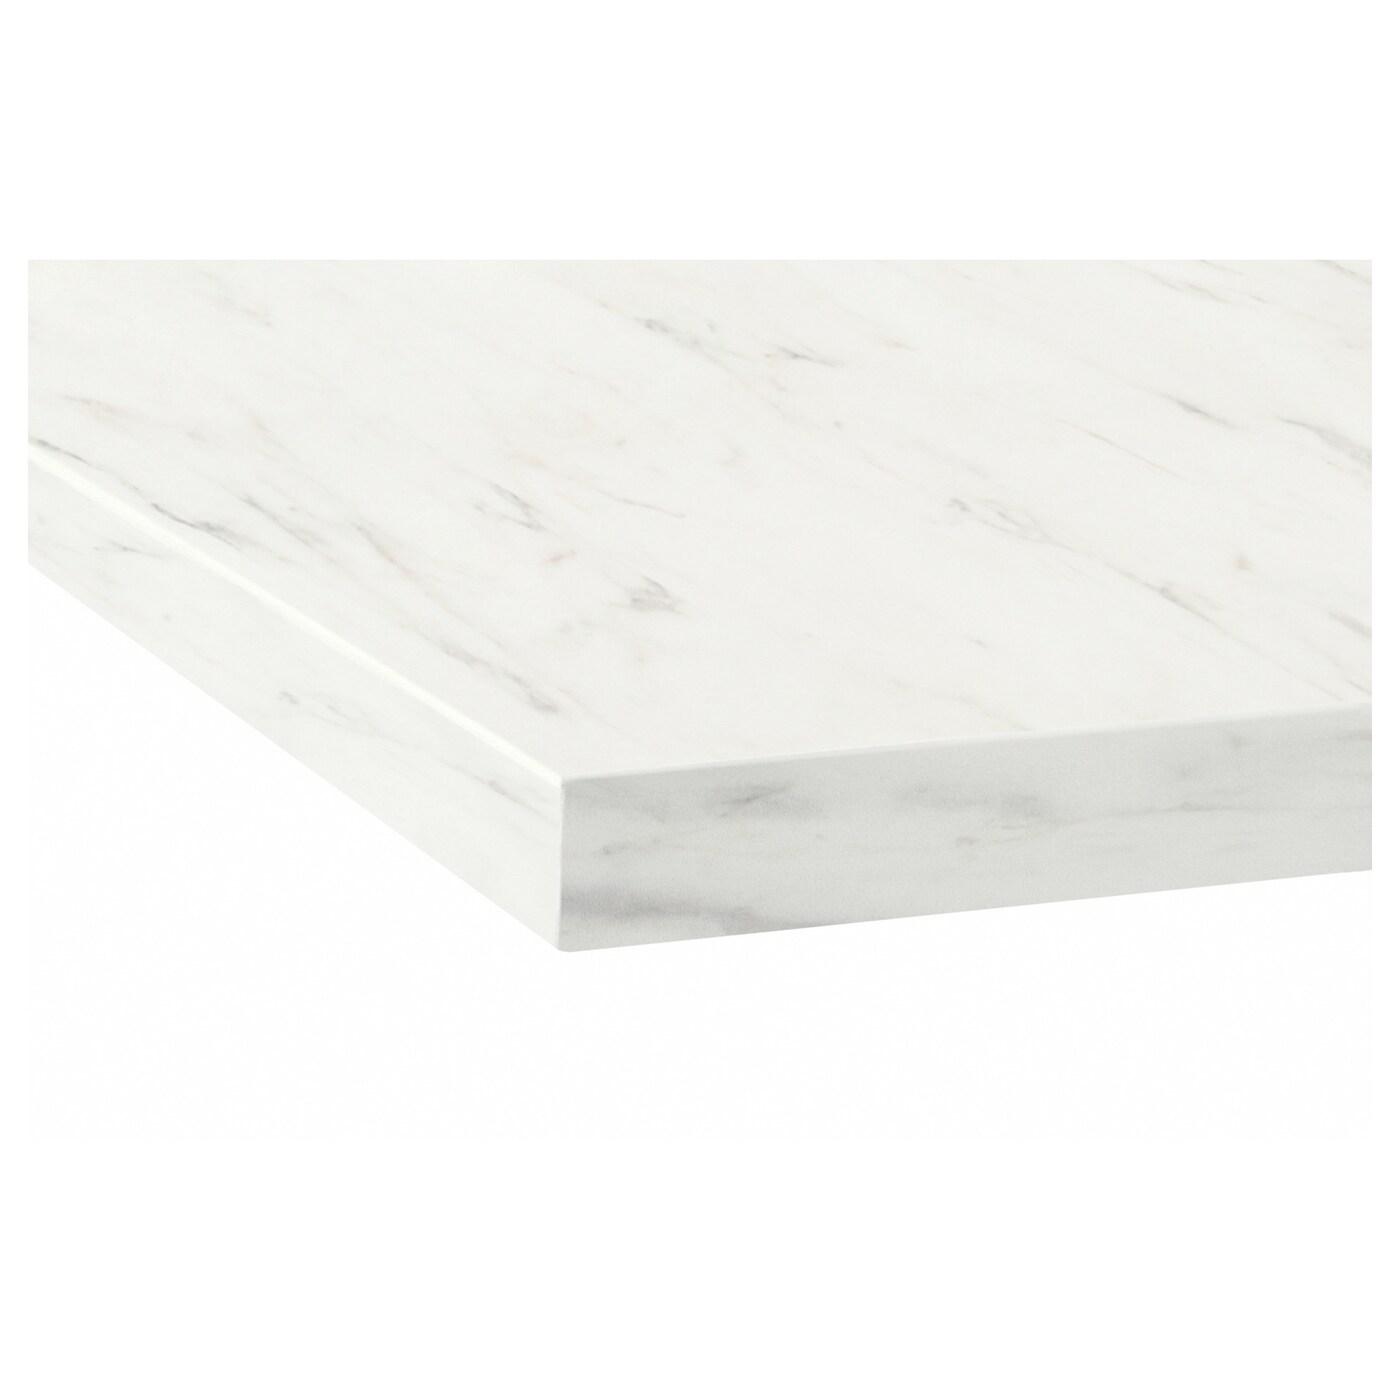 Ekbacken Plan De Travail Sur Mesure Blanc Marbre Stratifie 45 Ikea